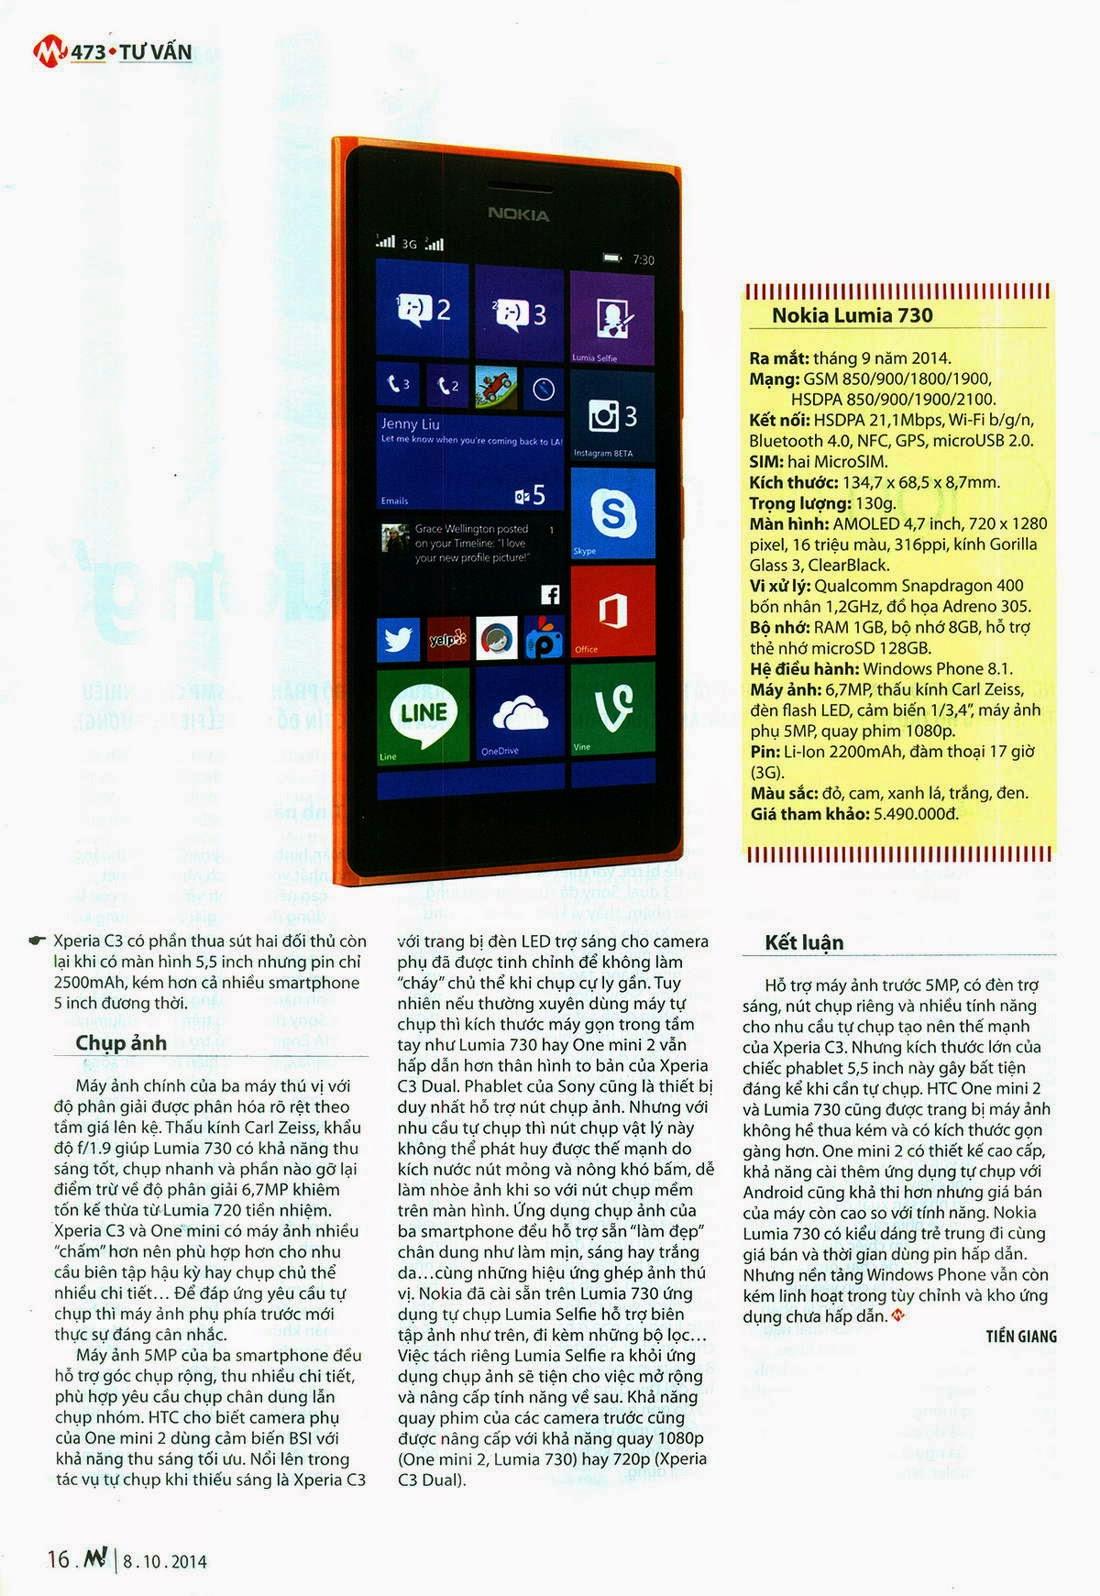 EChip Mobile 473 tapchicntt.com